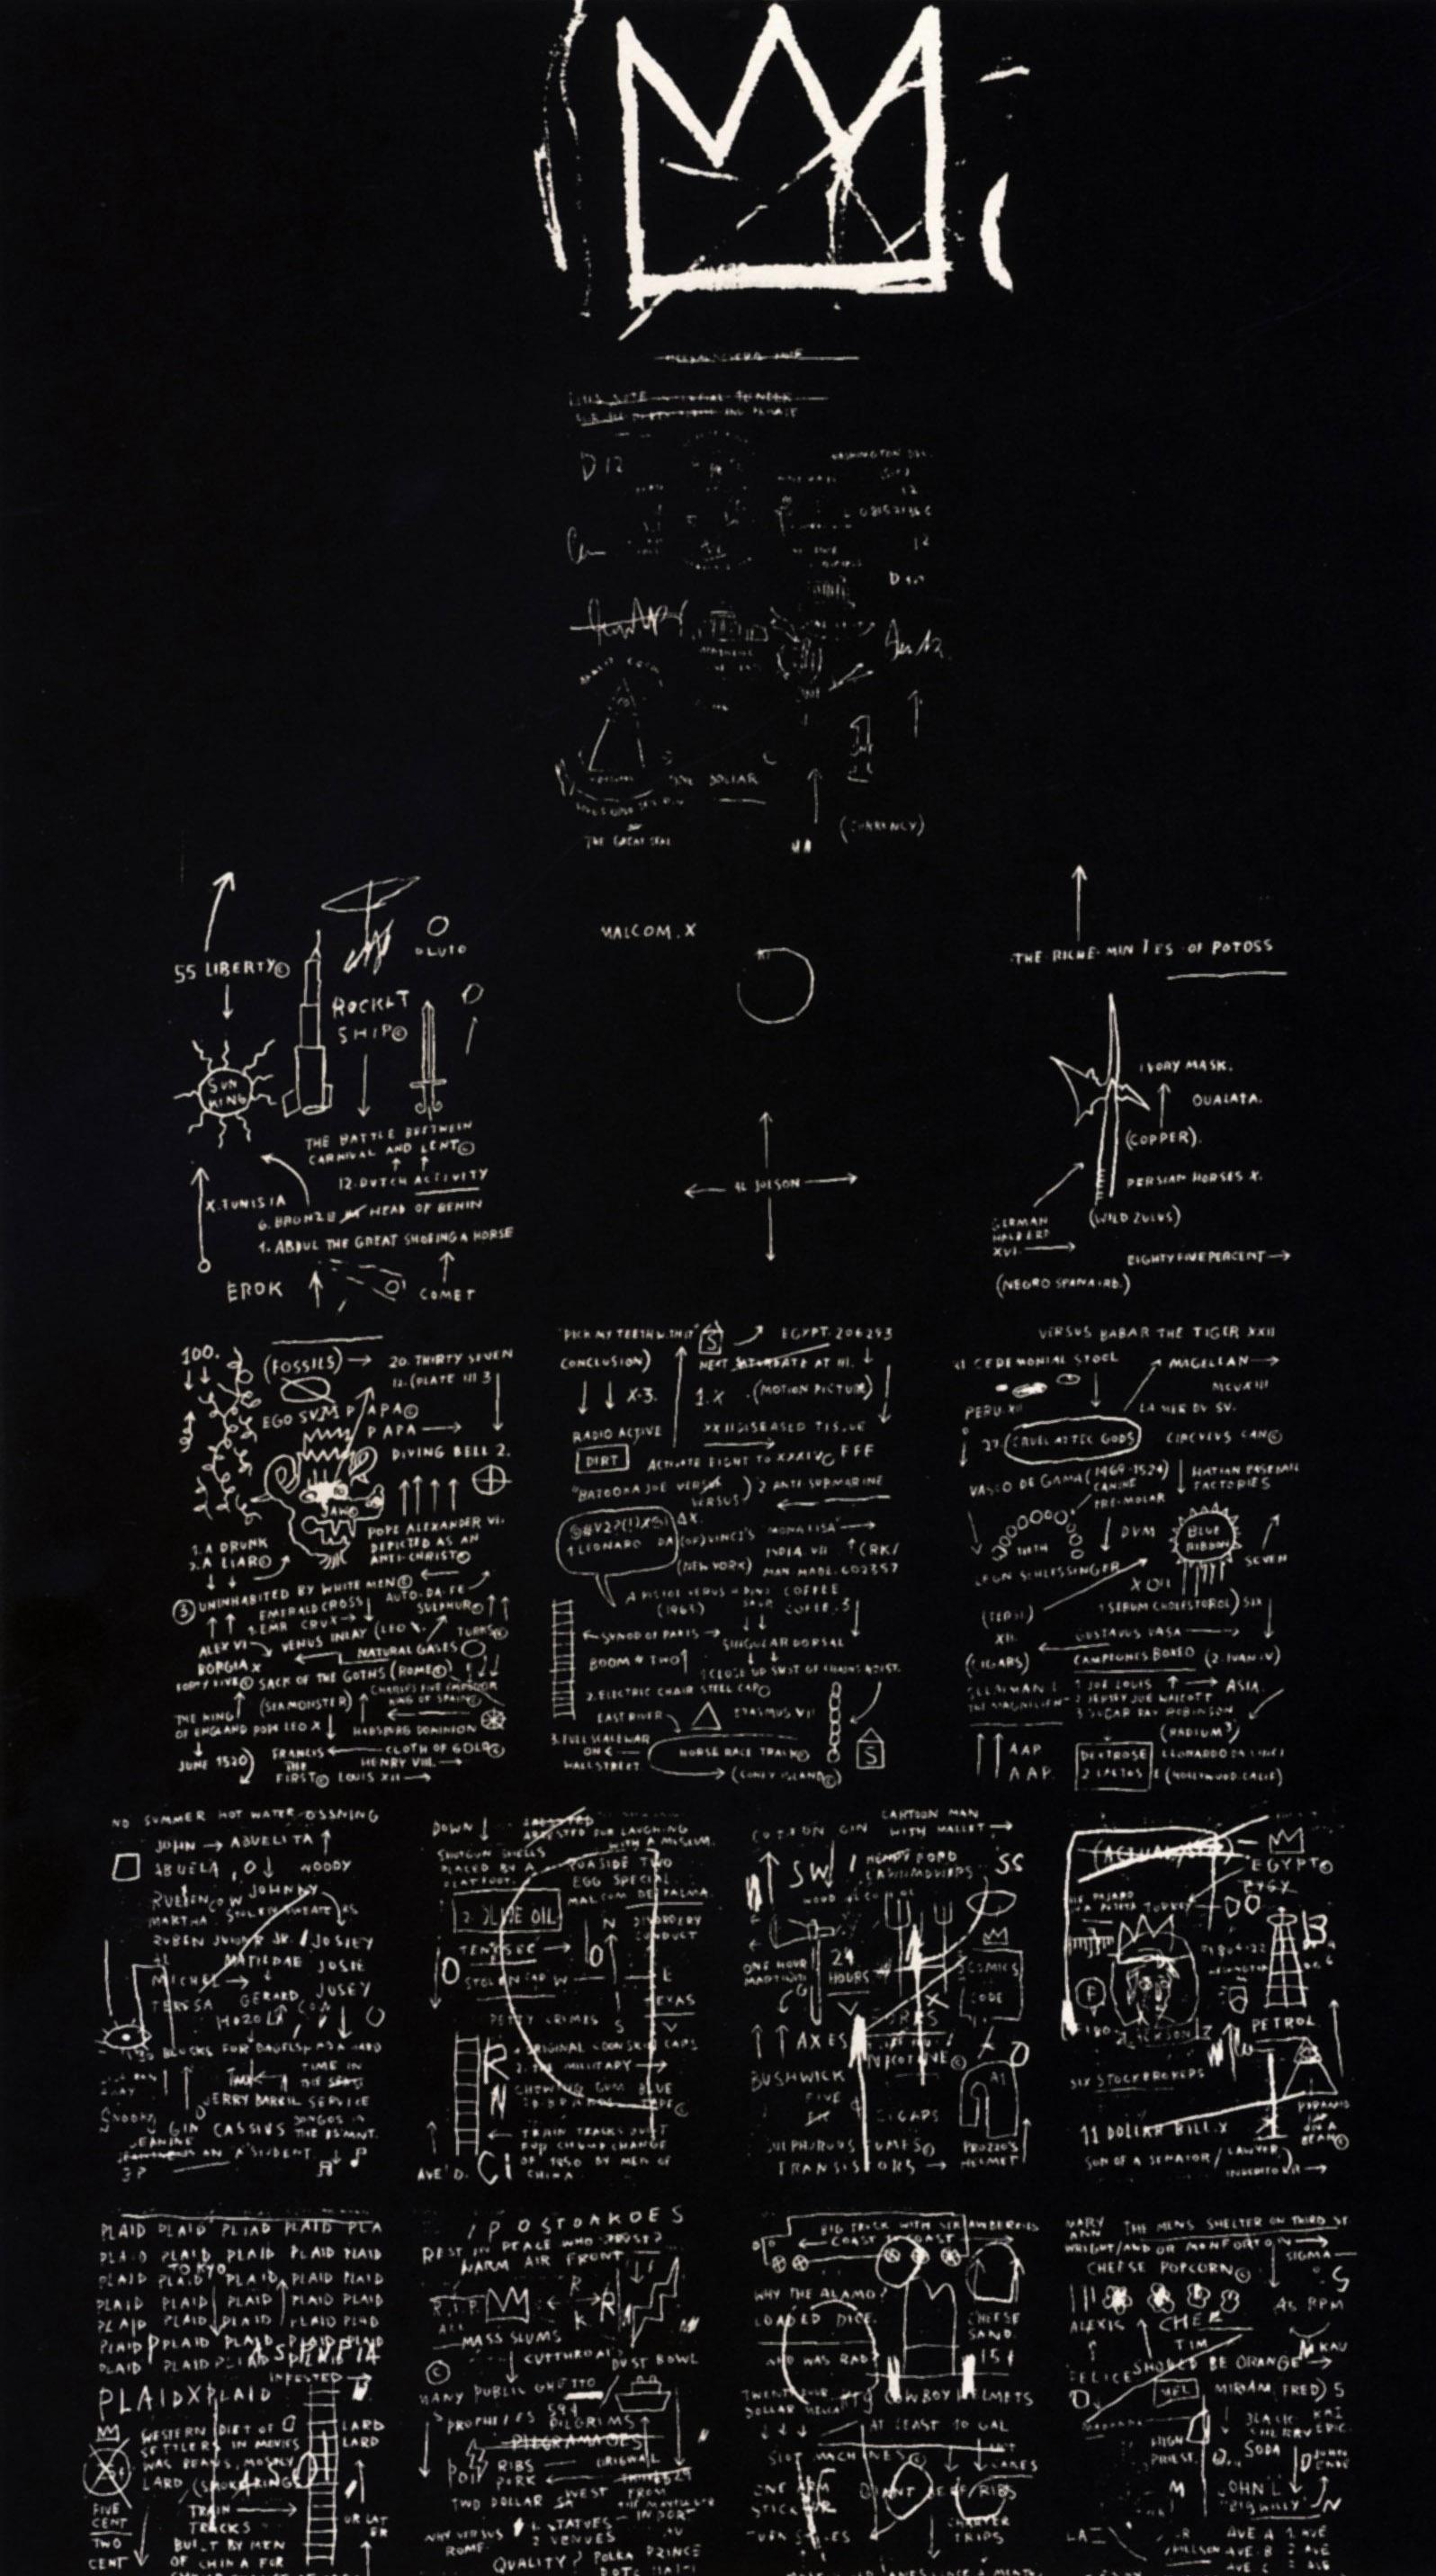 Tuxedo, 1982 - Jean-Michel Basquiat - WikiArt.org